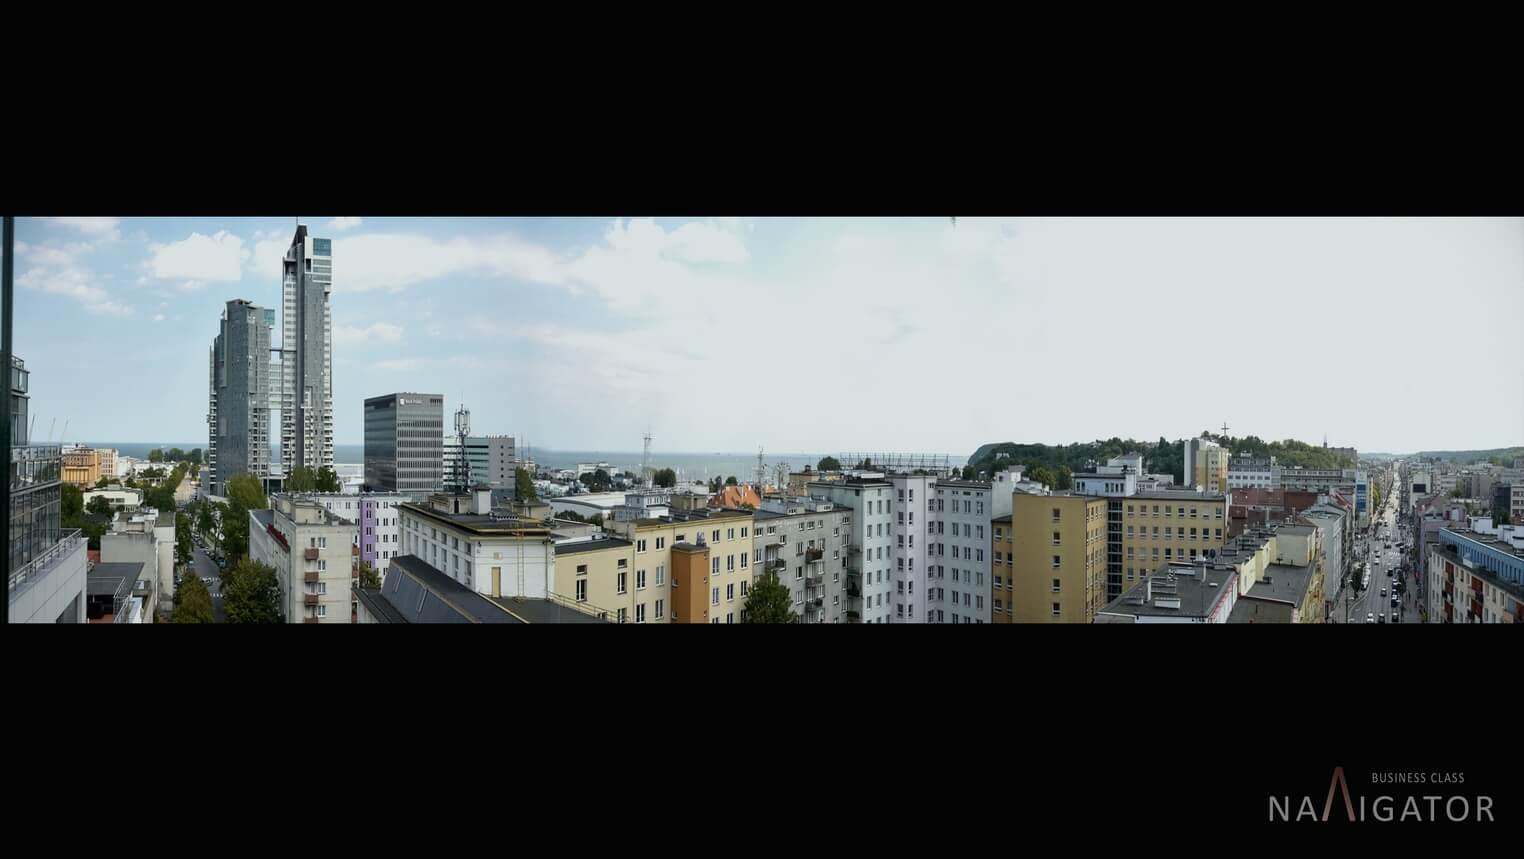 Apartament w Transatlantyku